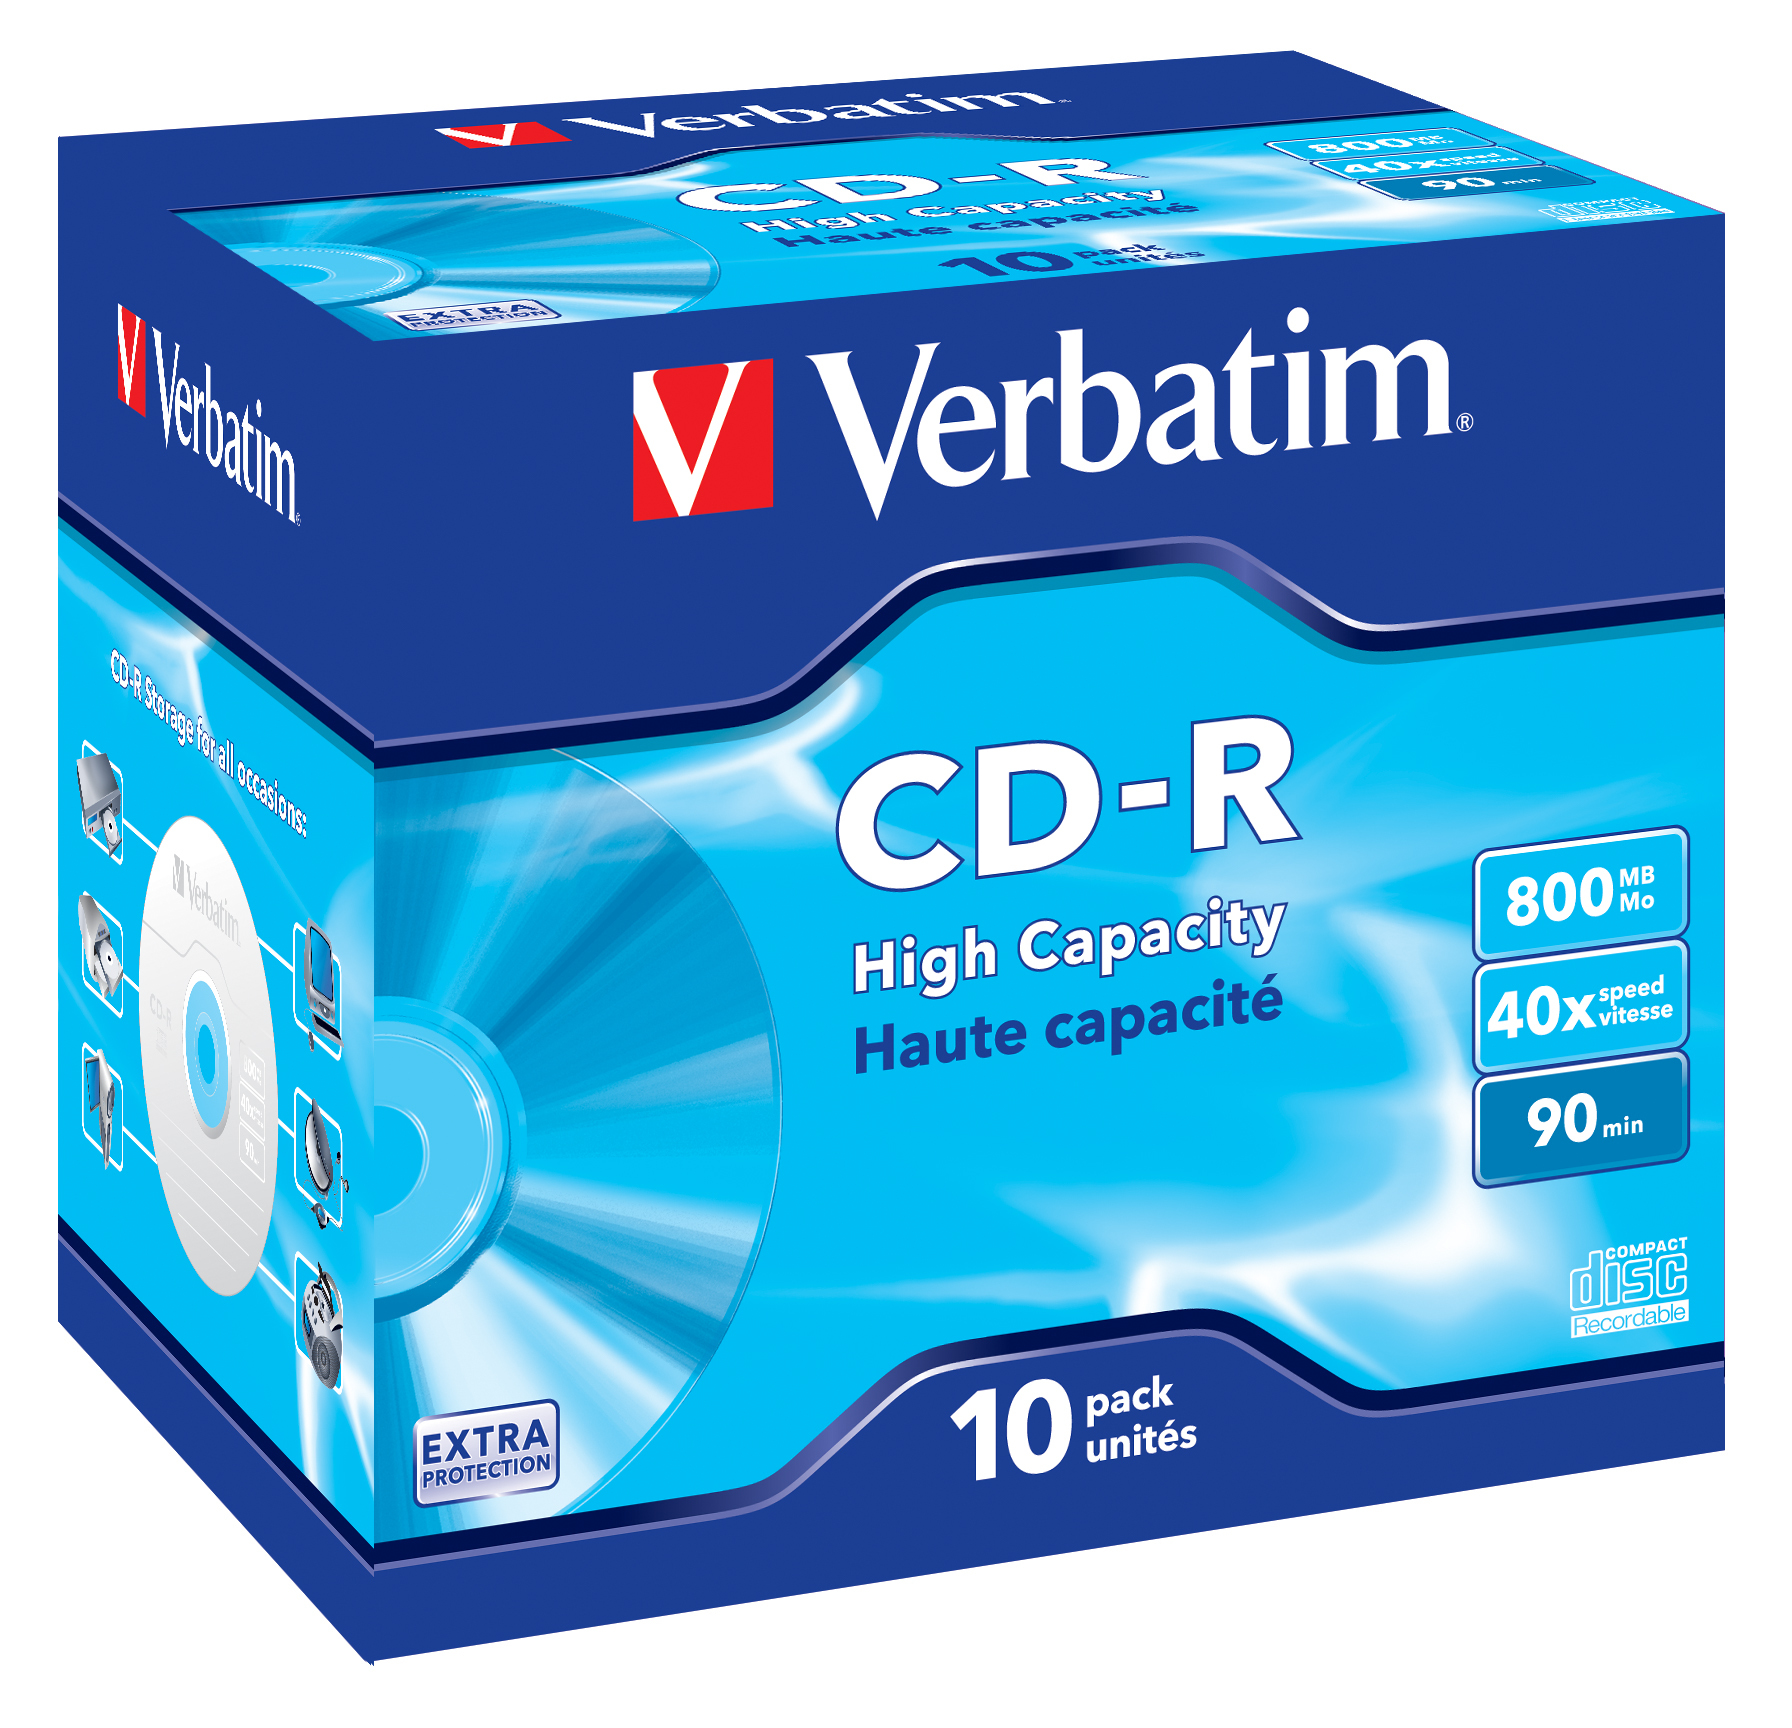 CD-R 800 MB, 40 speed (10-pack jewelcase)